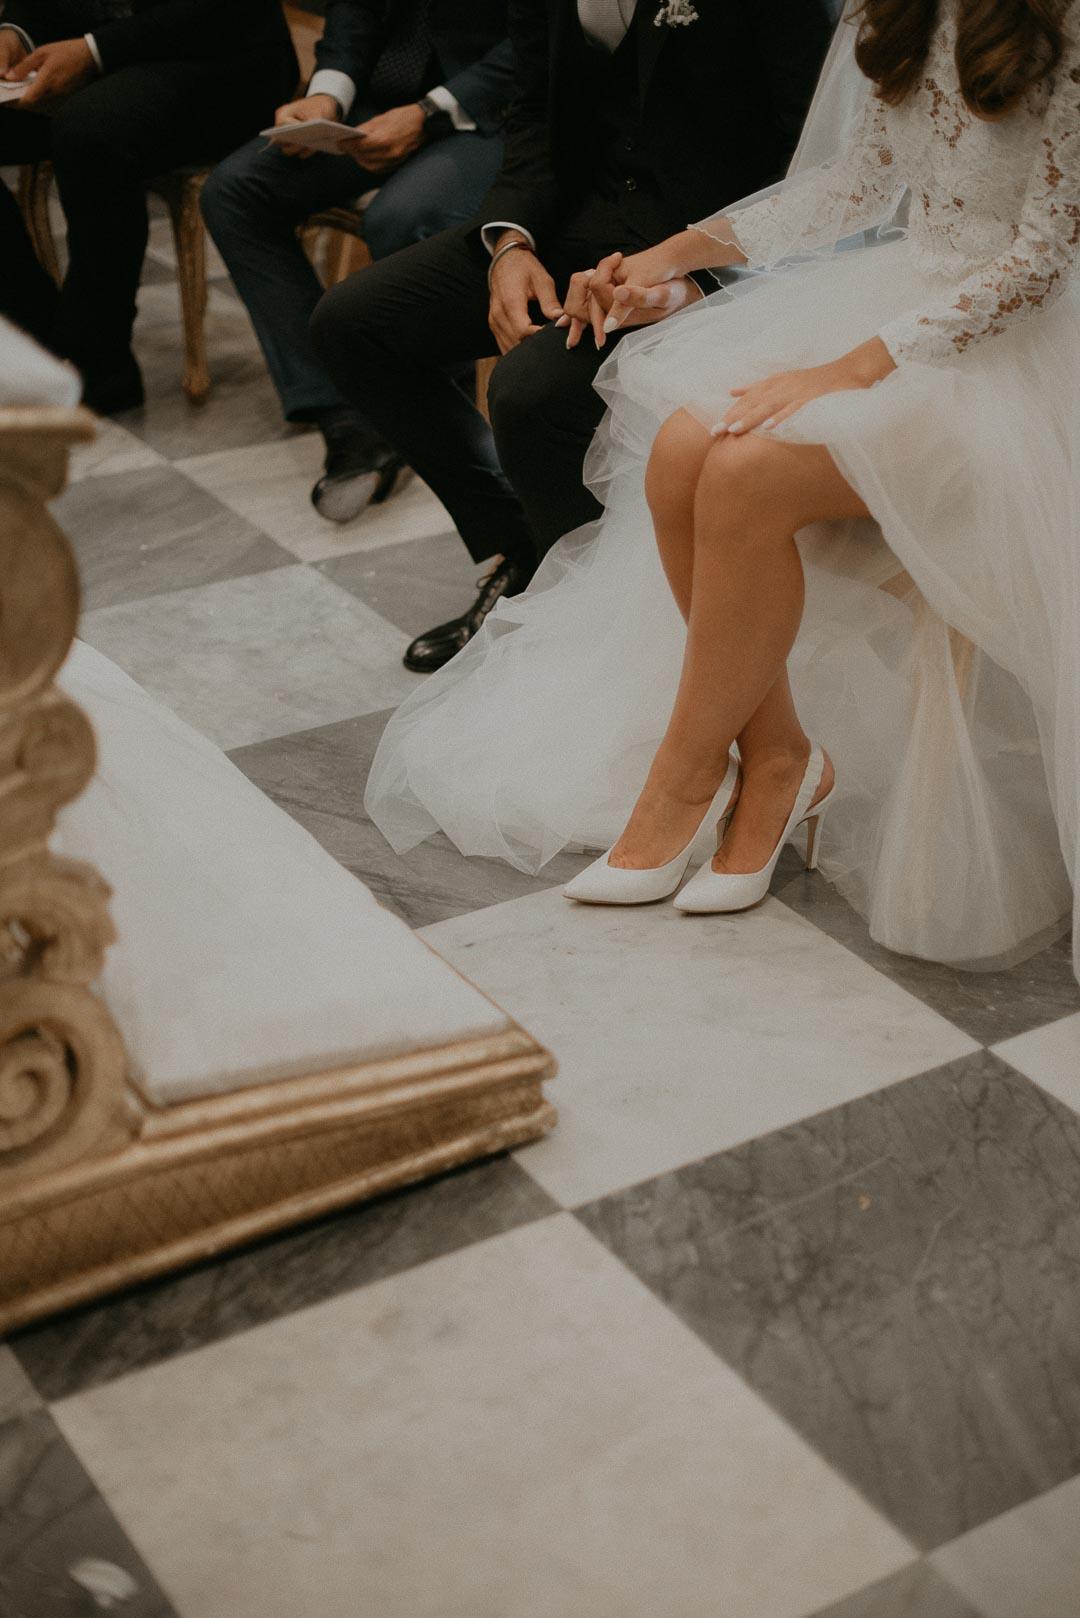 wedding-photographer-destination-fineart-bespoke-reportage-napoli-nabilah-vivianeizzo-spazio46-65